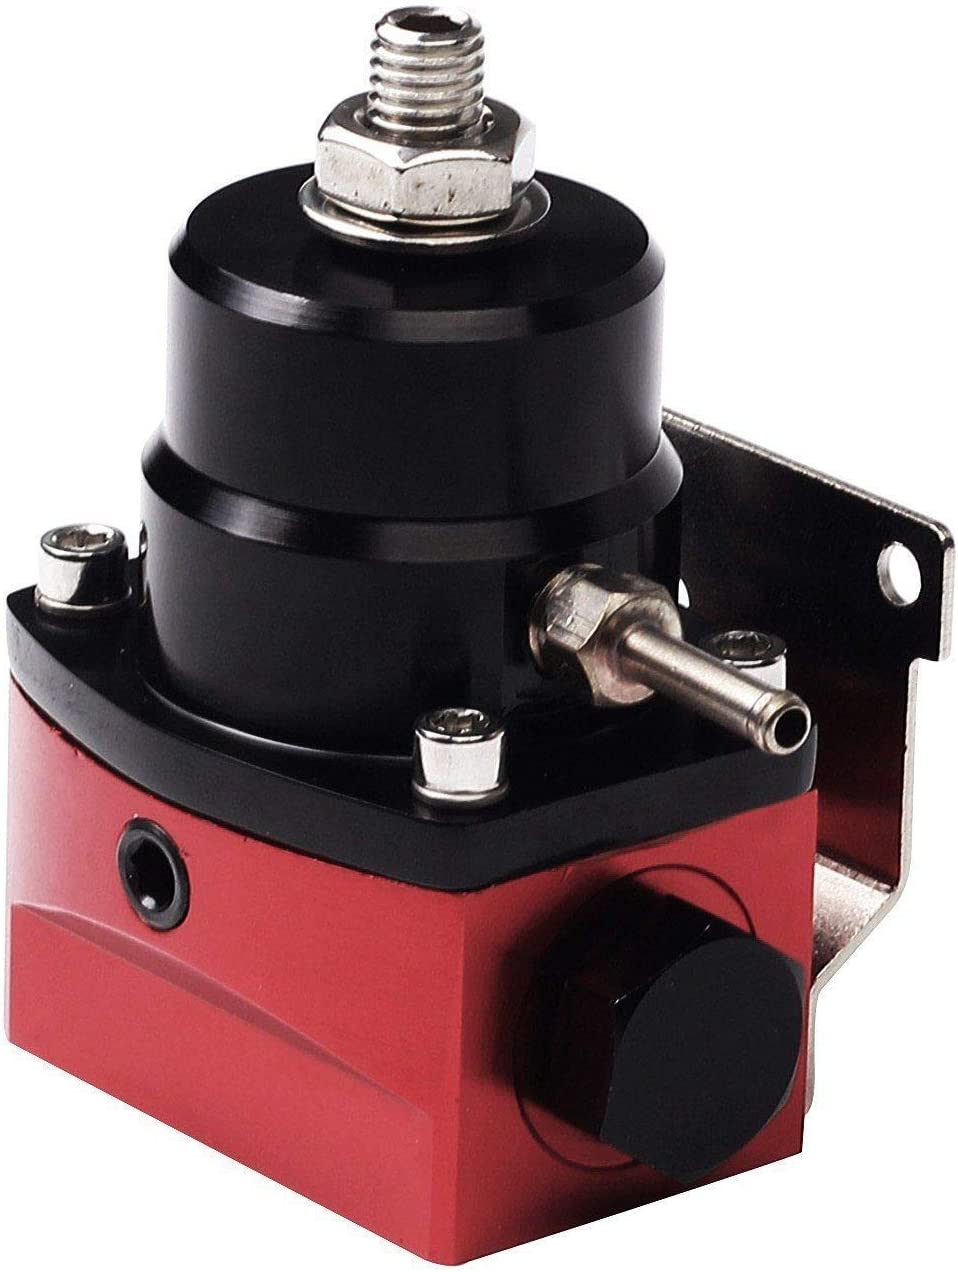 Black/&Red Universal Adjustable EFI Aluminum Fuel Pressure Regulator Kit with 0-100 psi Gauge AN6-6AN Fuel Line Hose Fittings